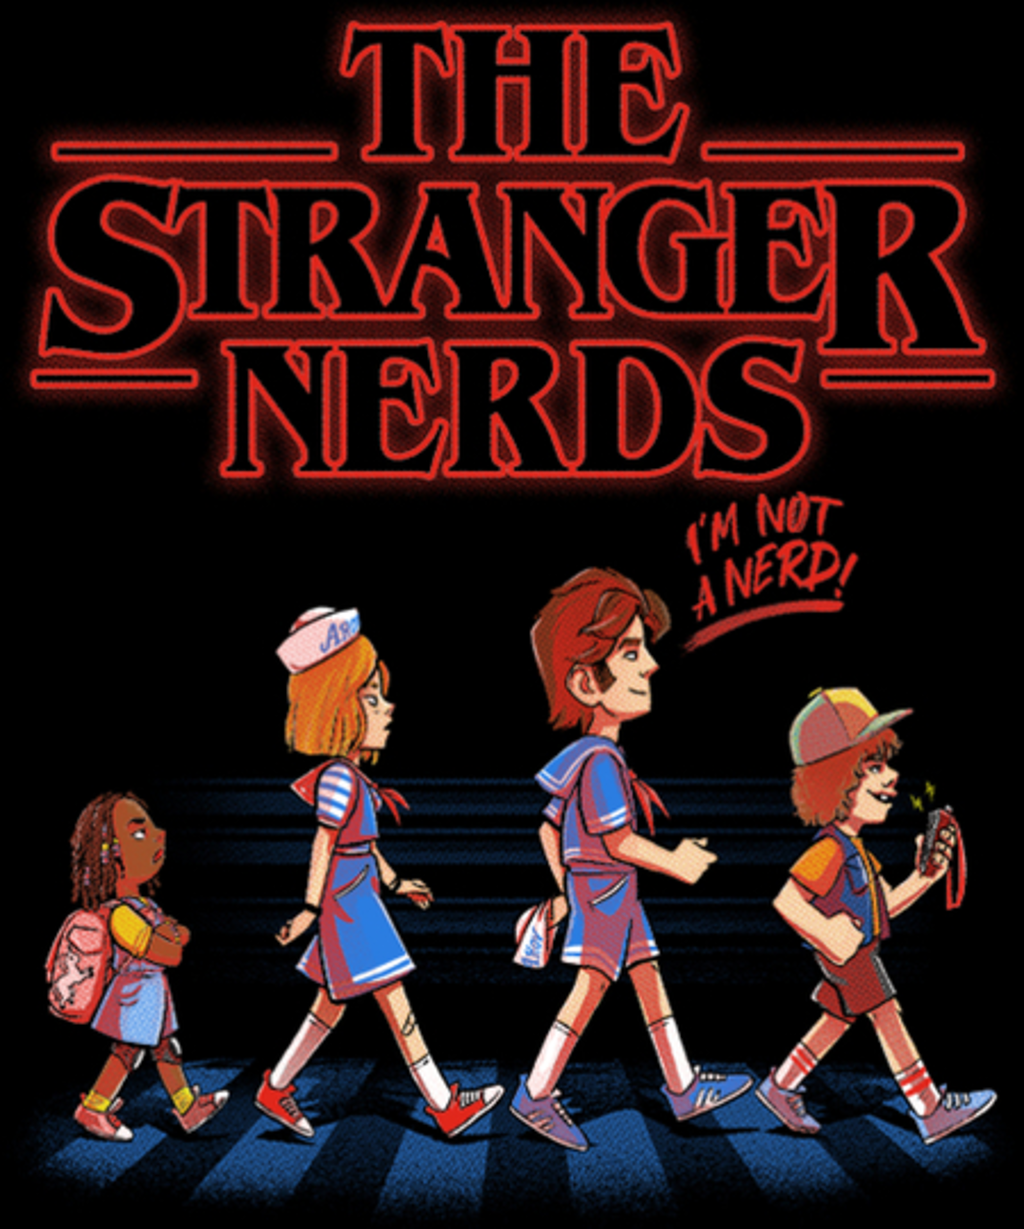 Qwertee: The Stranger Nerds